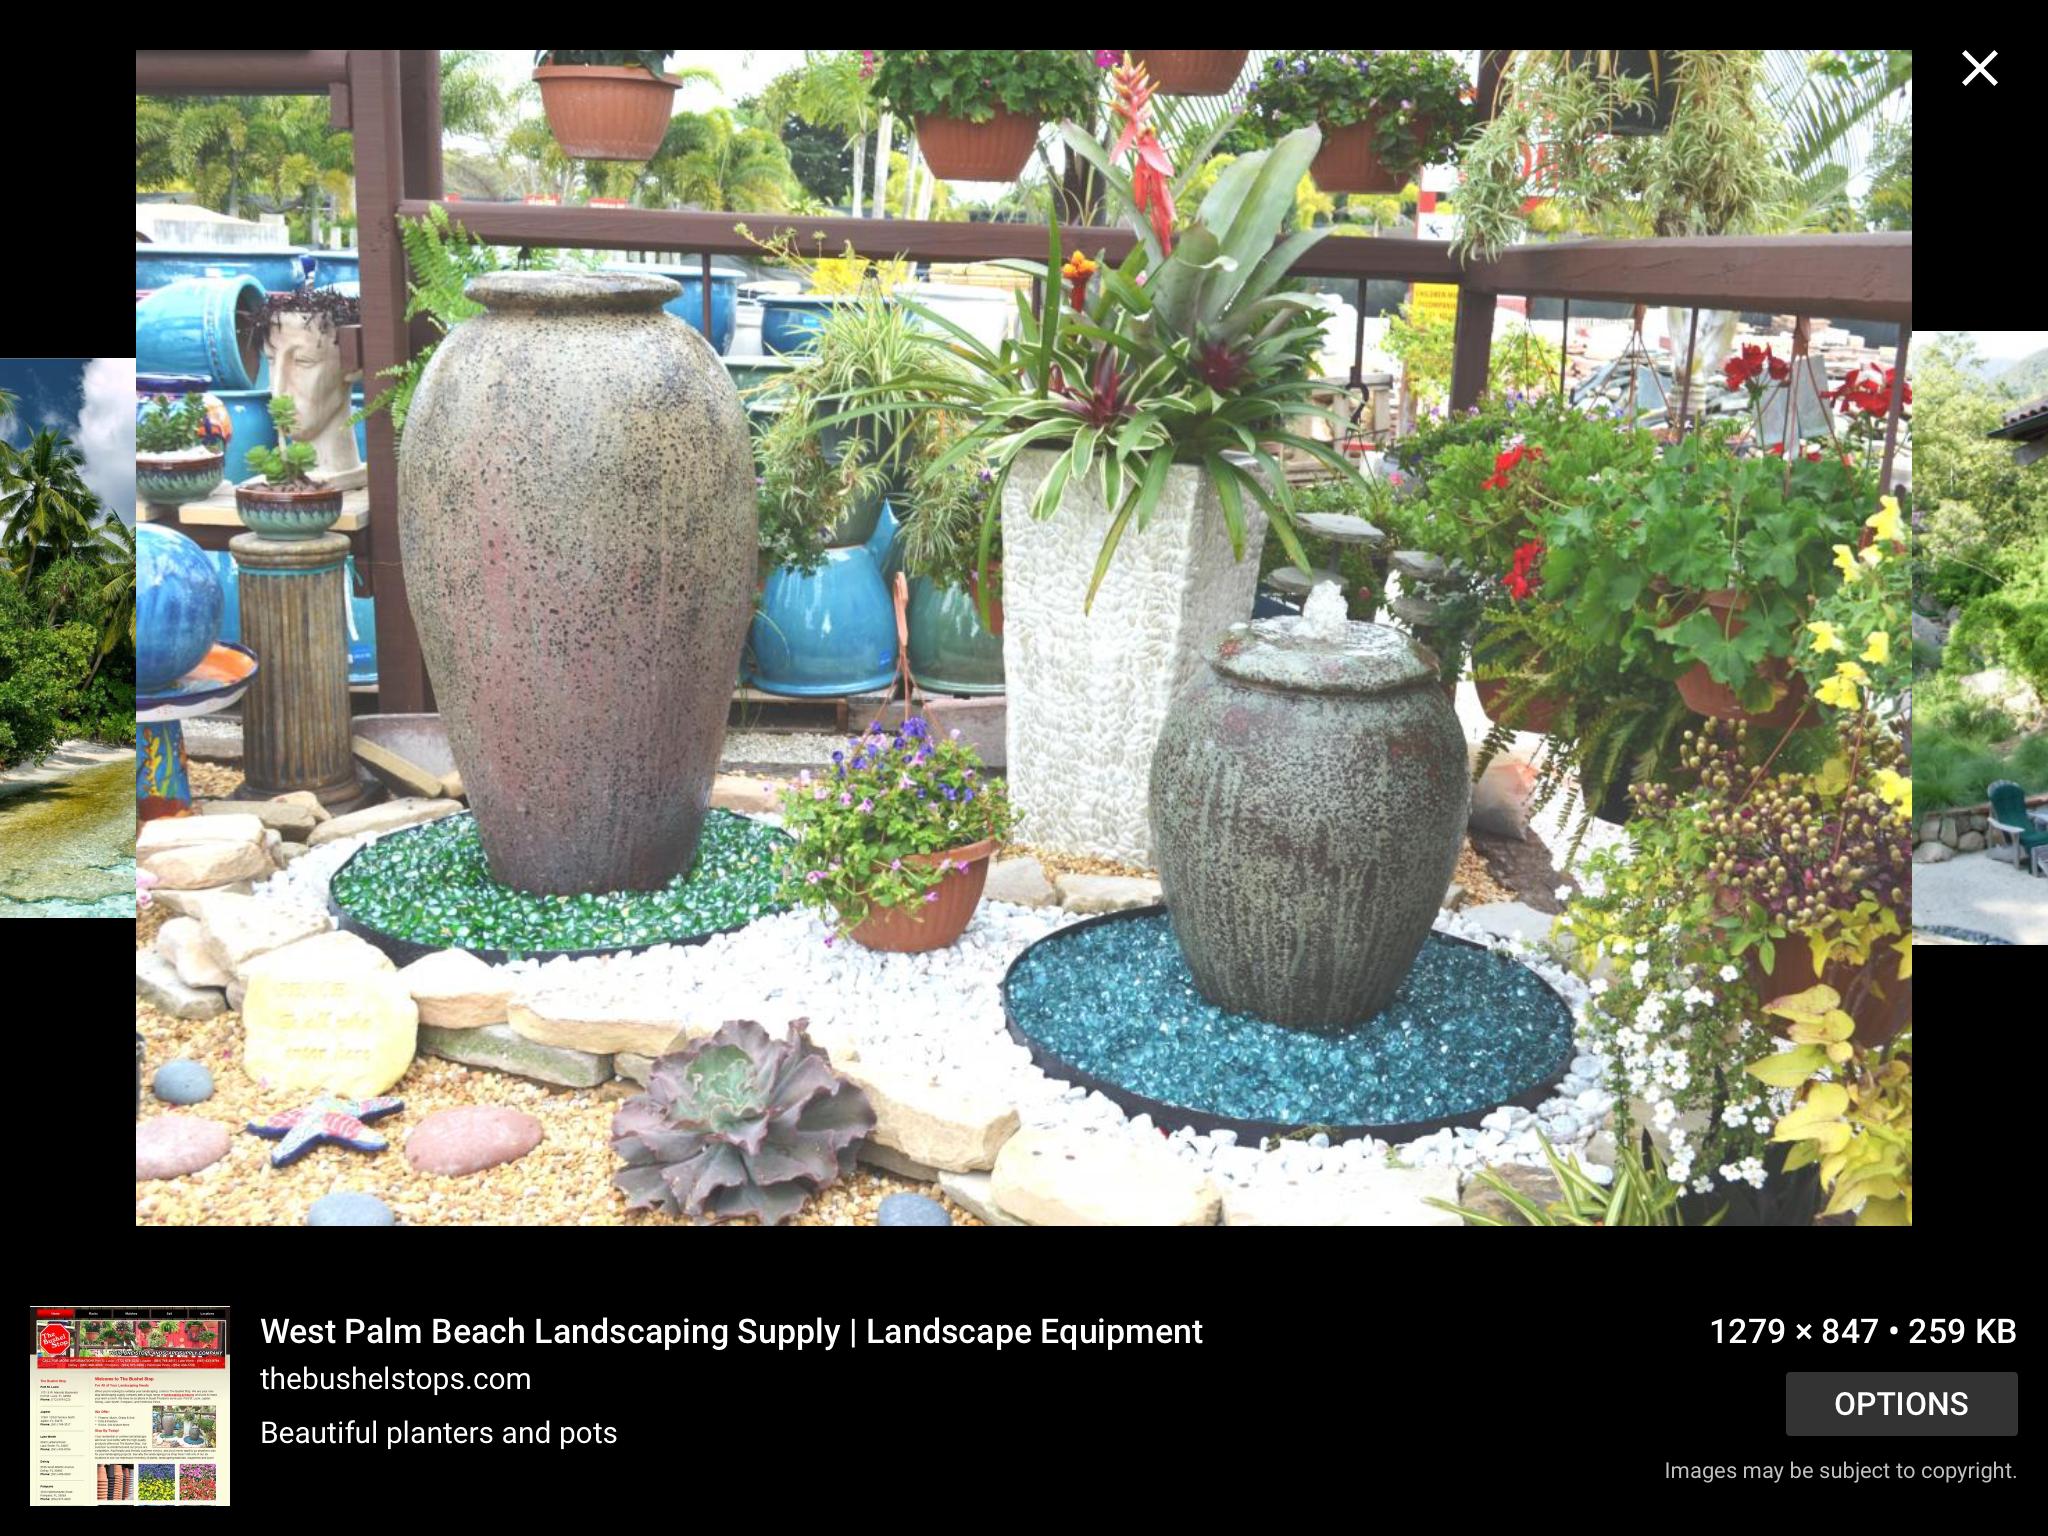 9bf8998177e4643afe9c53cb1b070747 - Melting Pot In Palm Beach Gardens